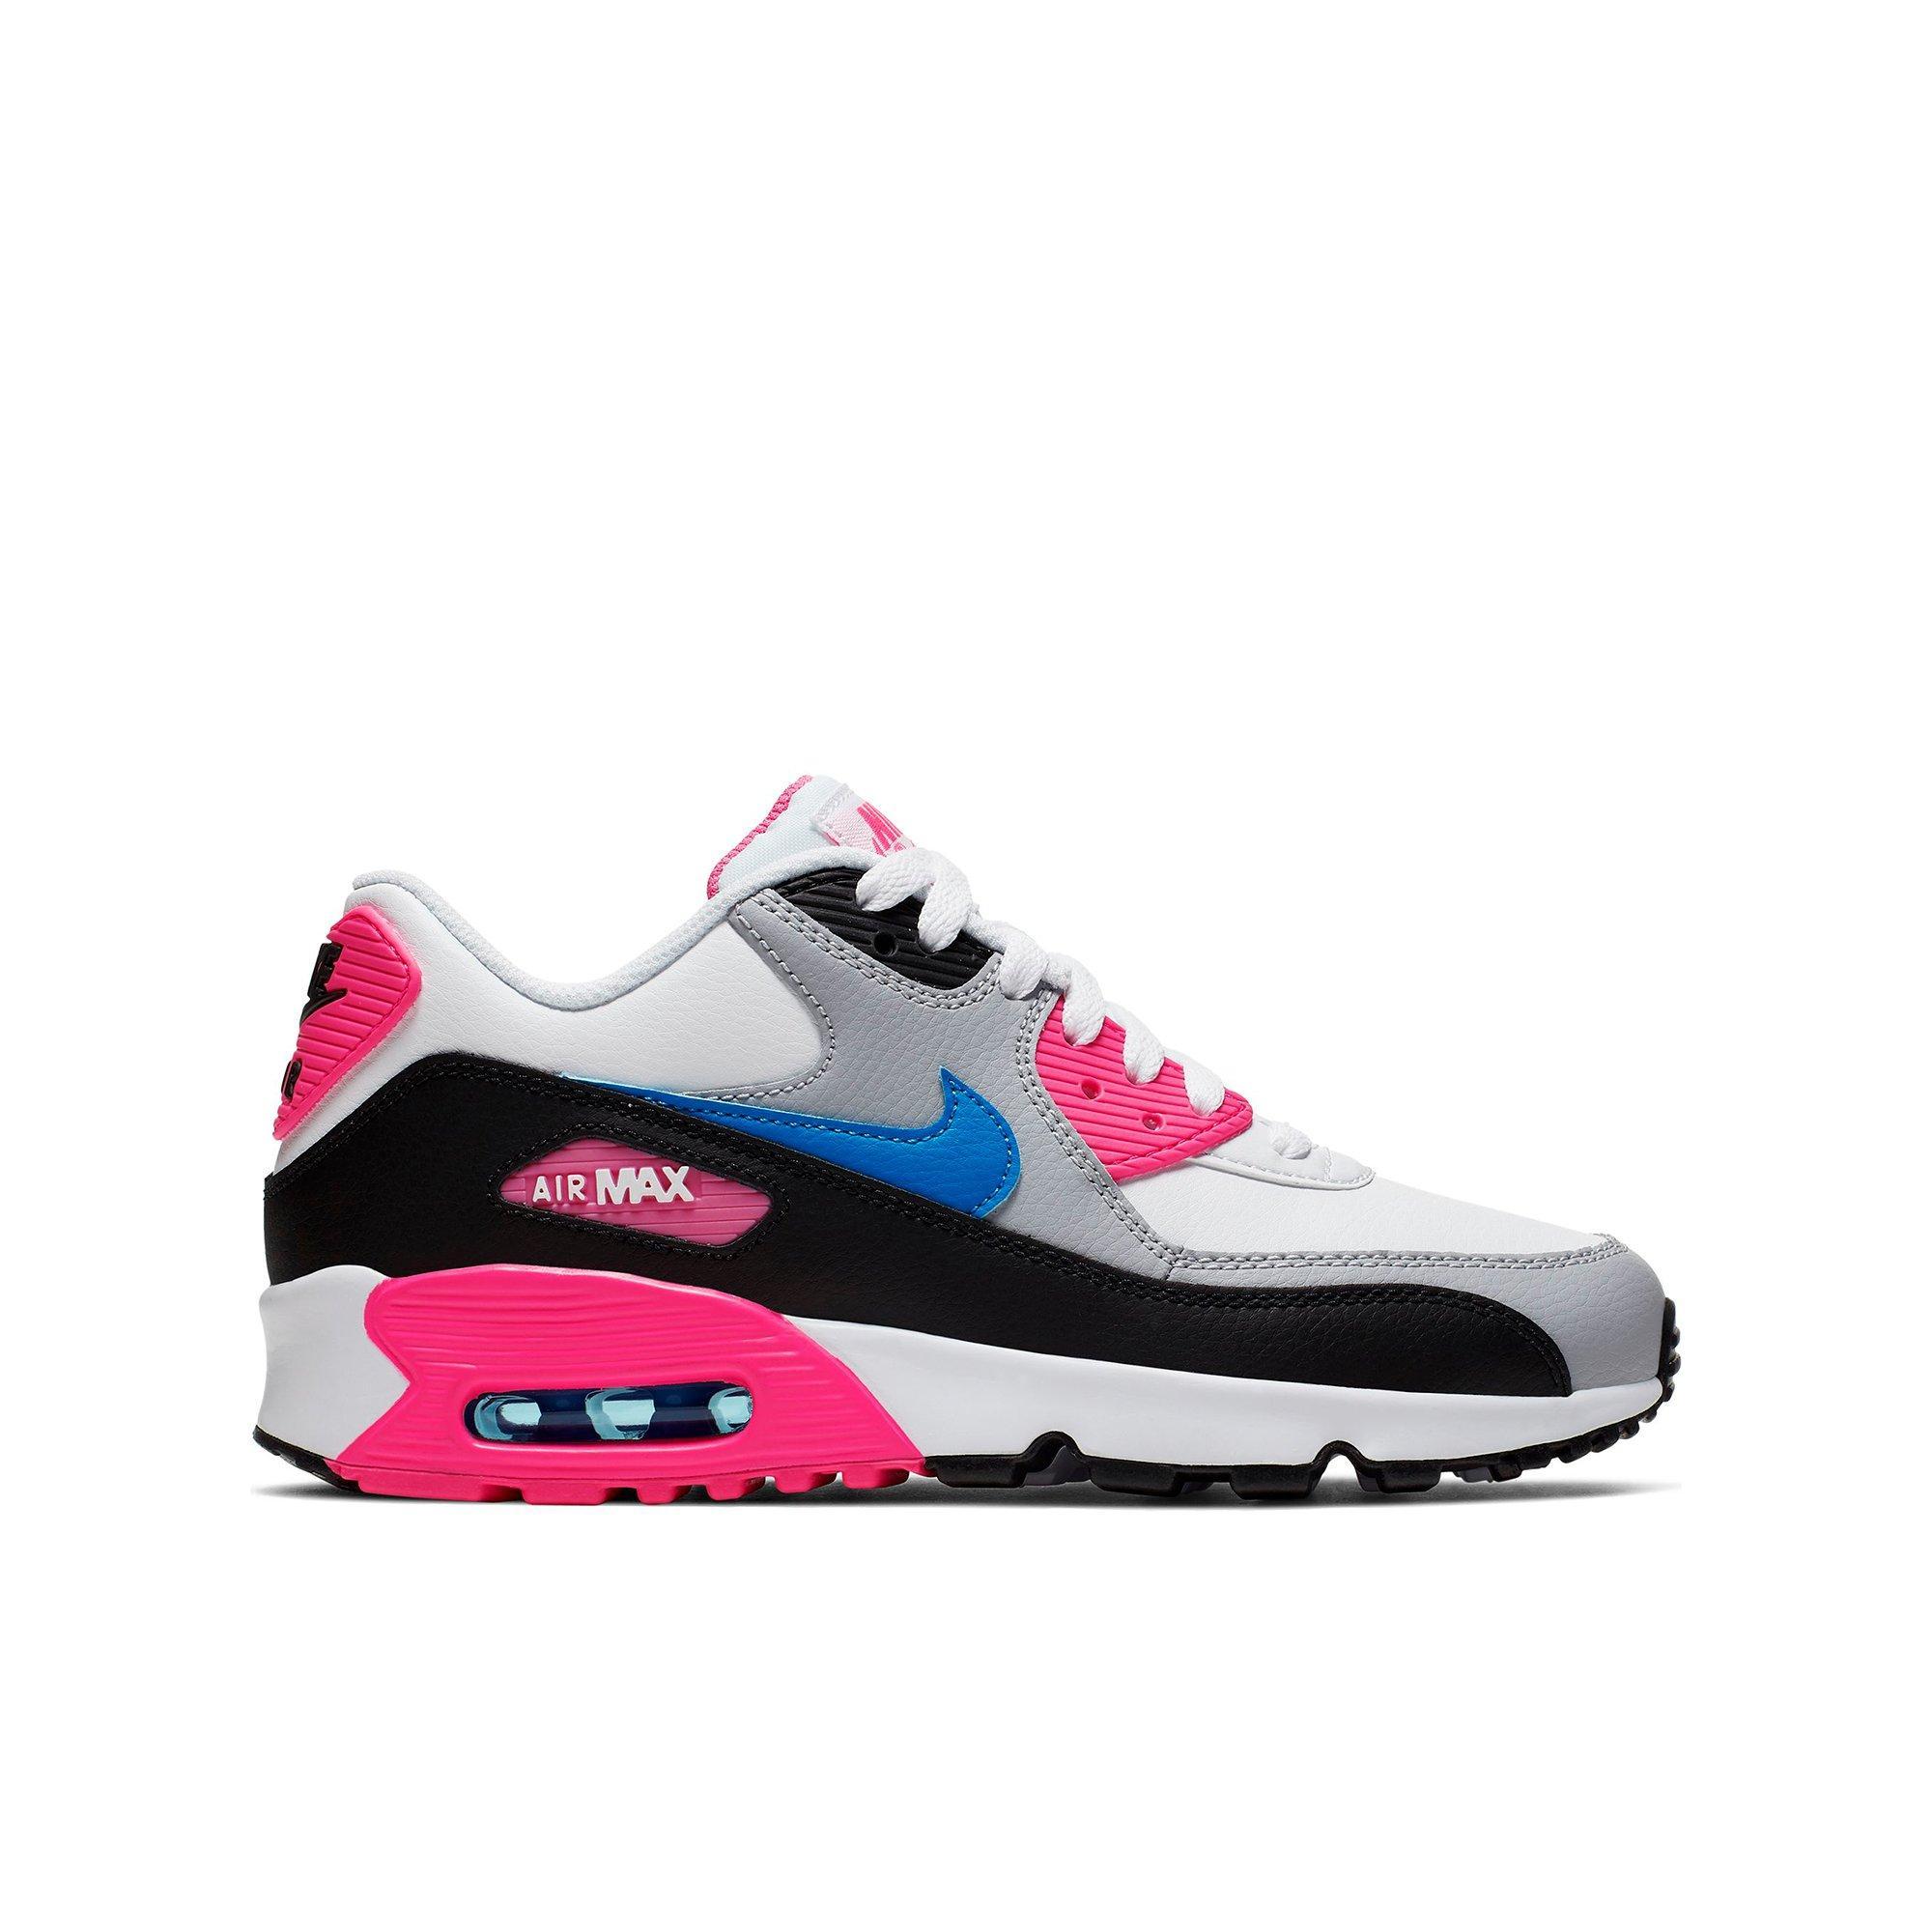 pink and blue air max